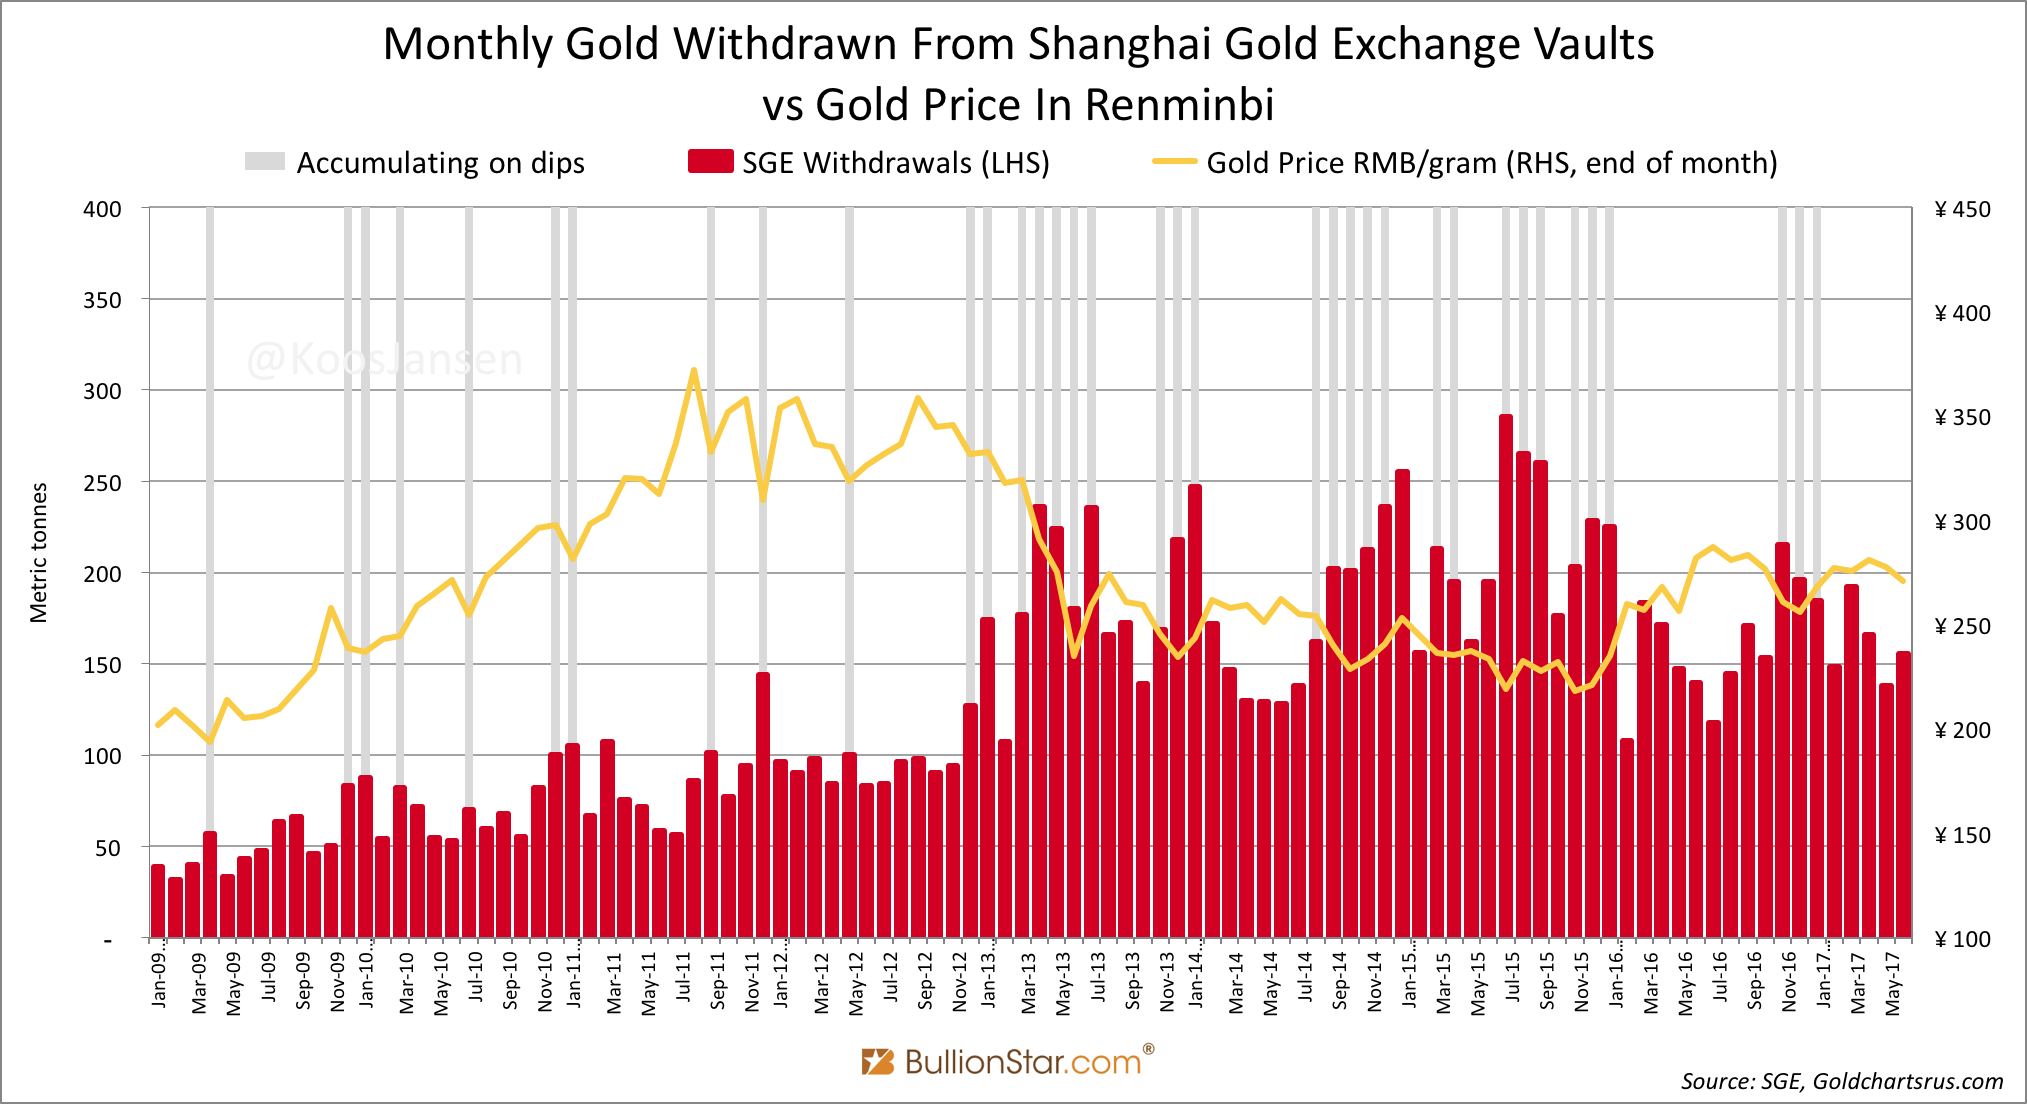 Shanghai Gold Exchange Vaults, Jan 2009 - June 2017